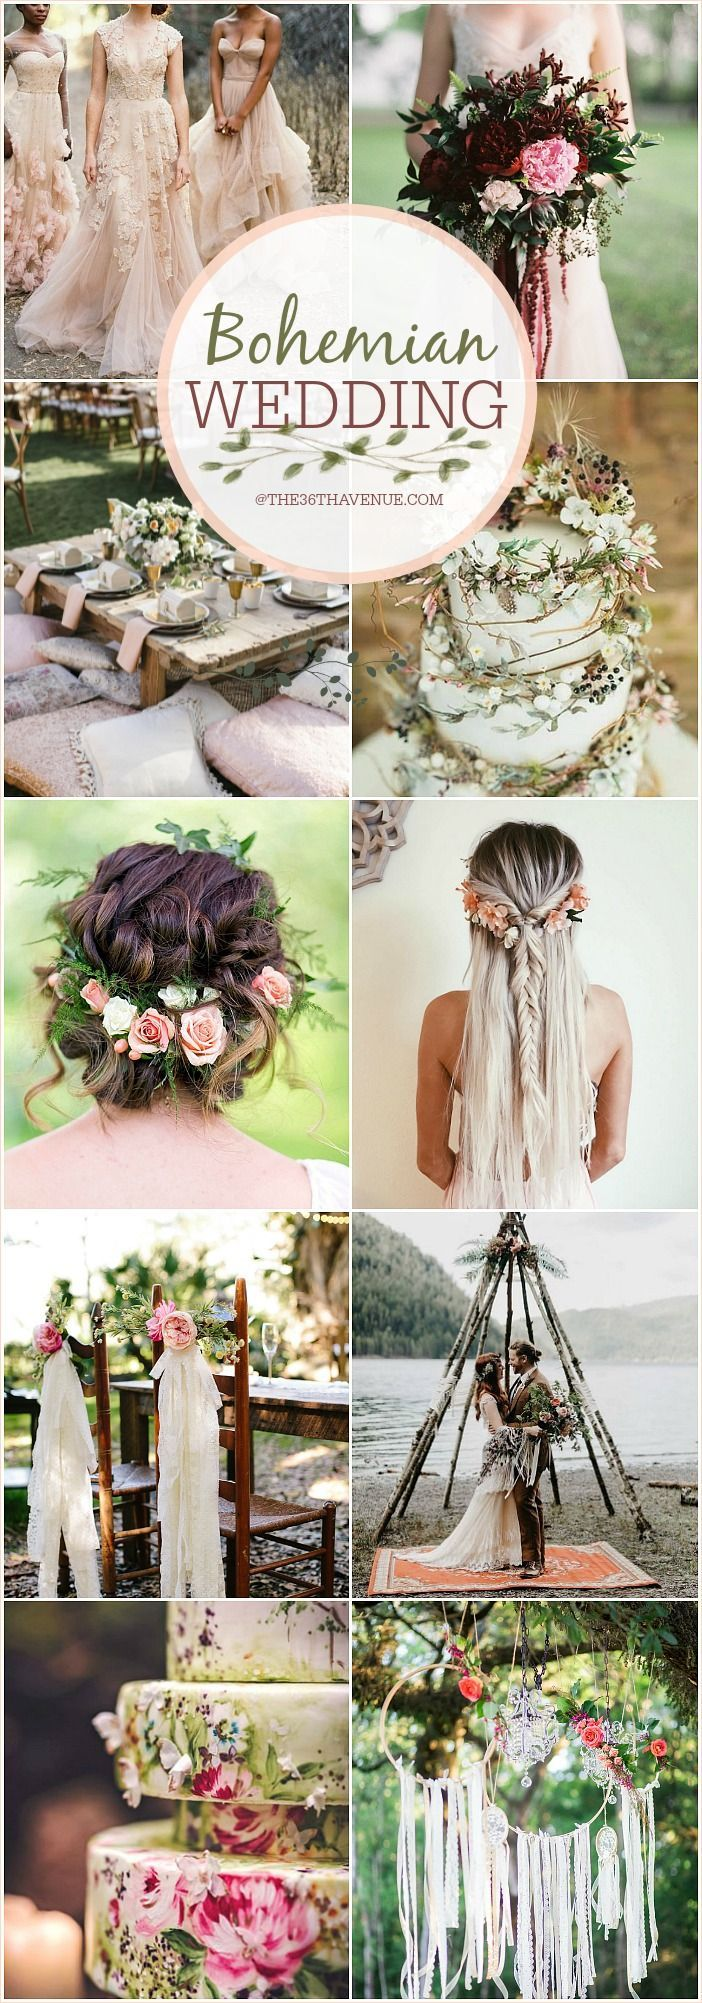 345 Best Bohemian Wedding Ideas Images On Pinterest